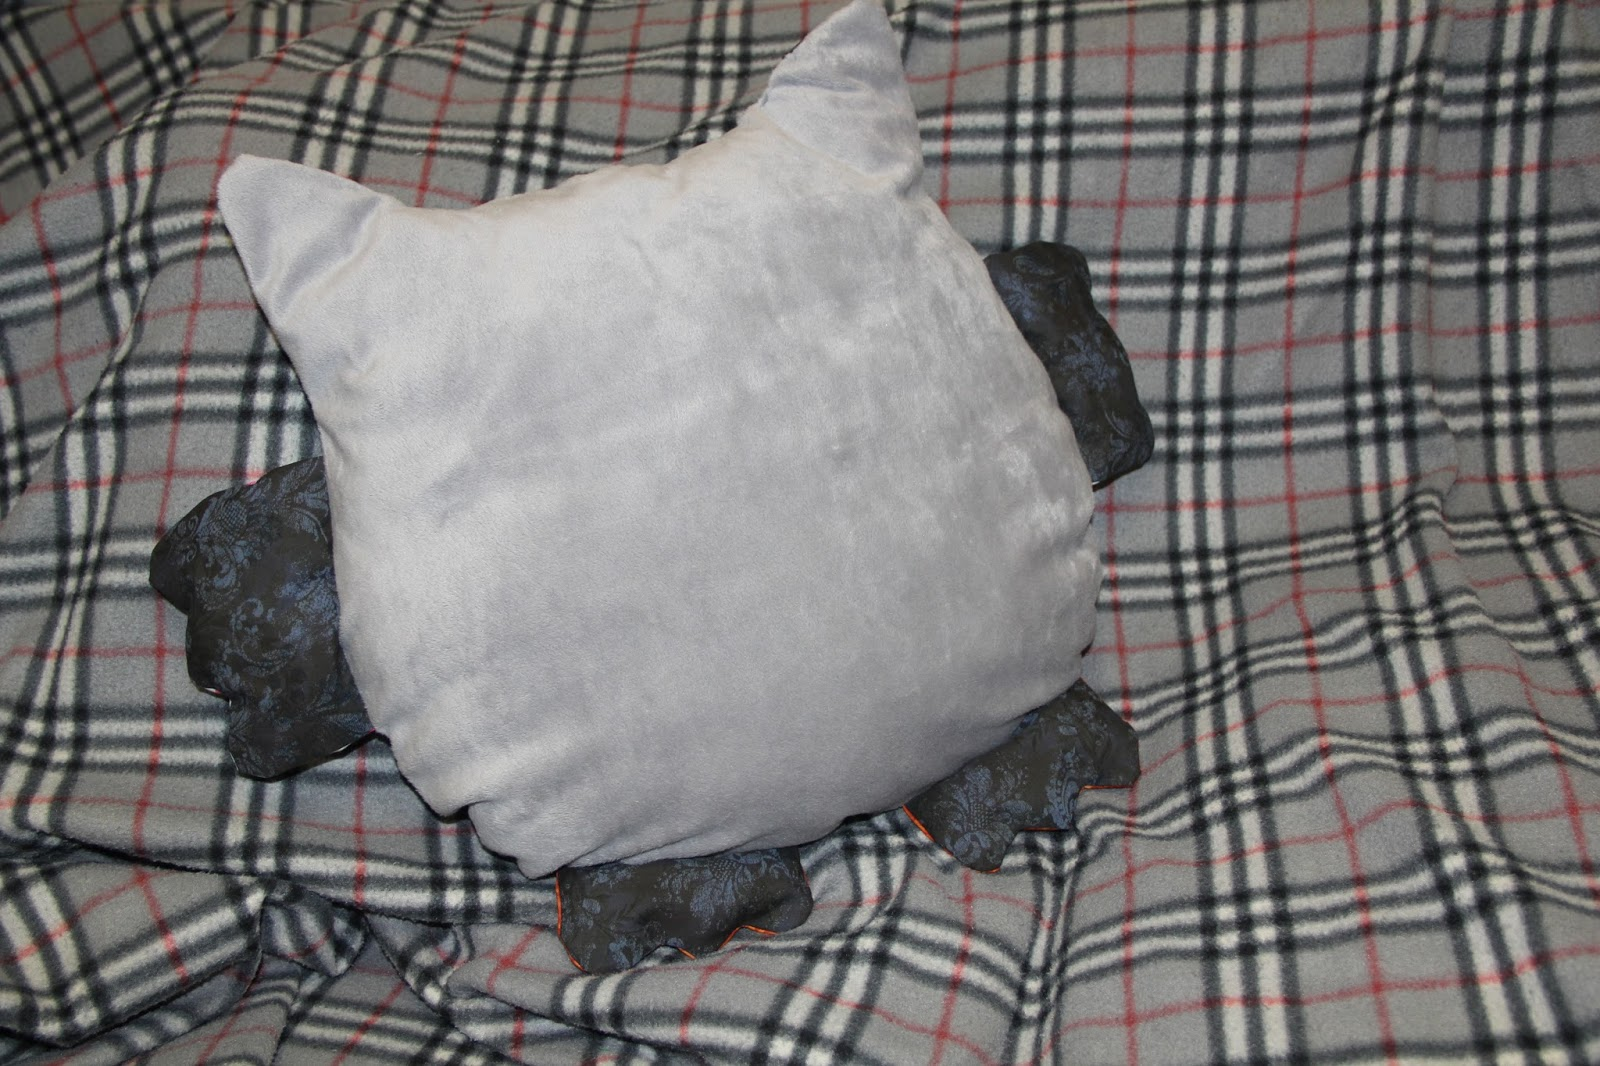 совушка, сплюшка, подушка